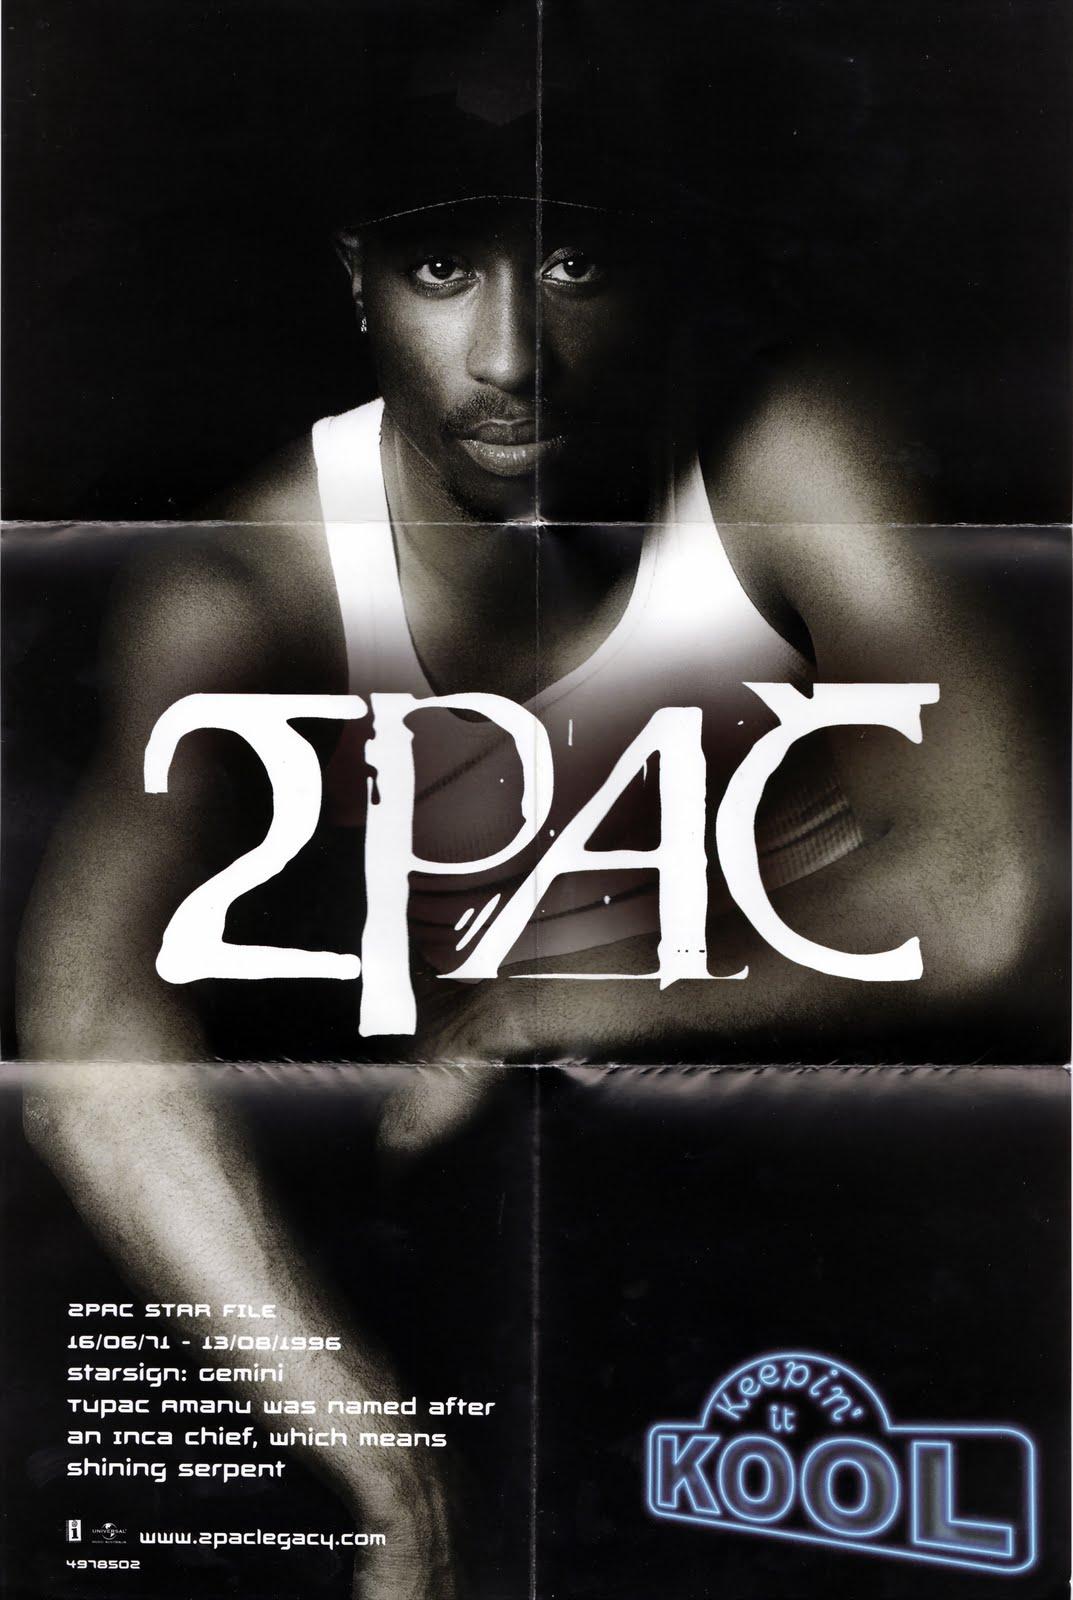 2Pac – Thugz Mansion (Acoustic Version) Lyrics - Genius